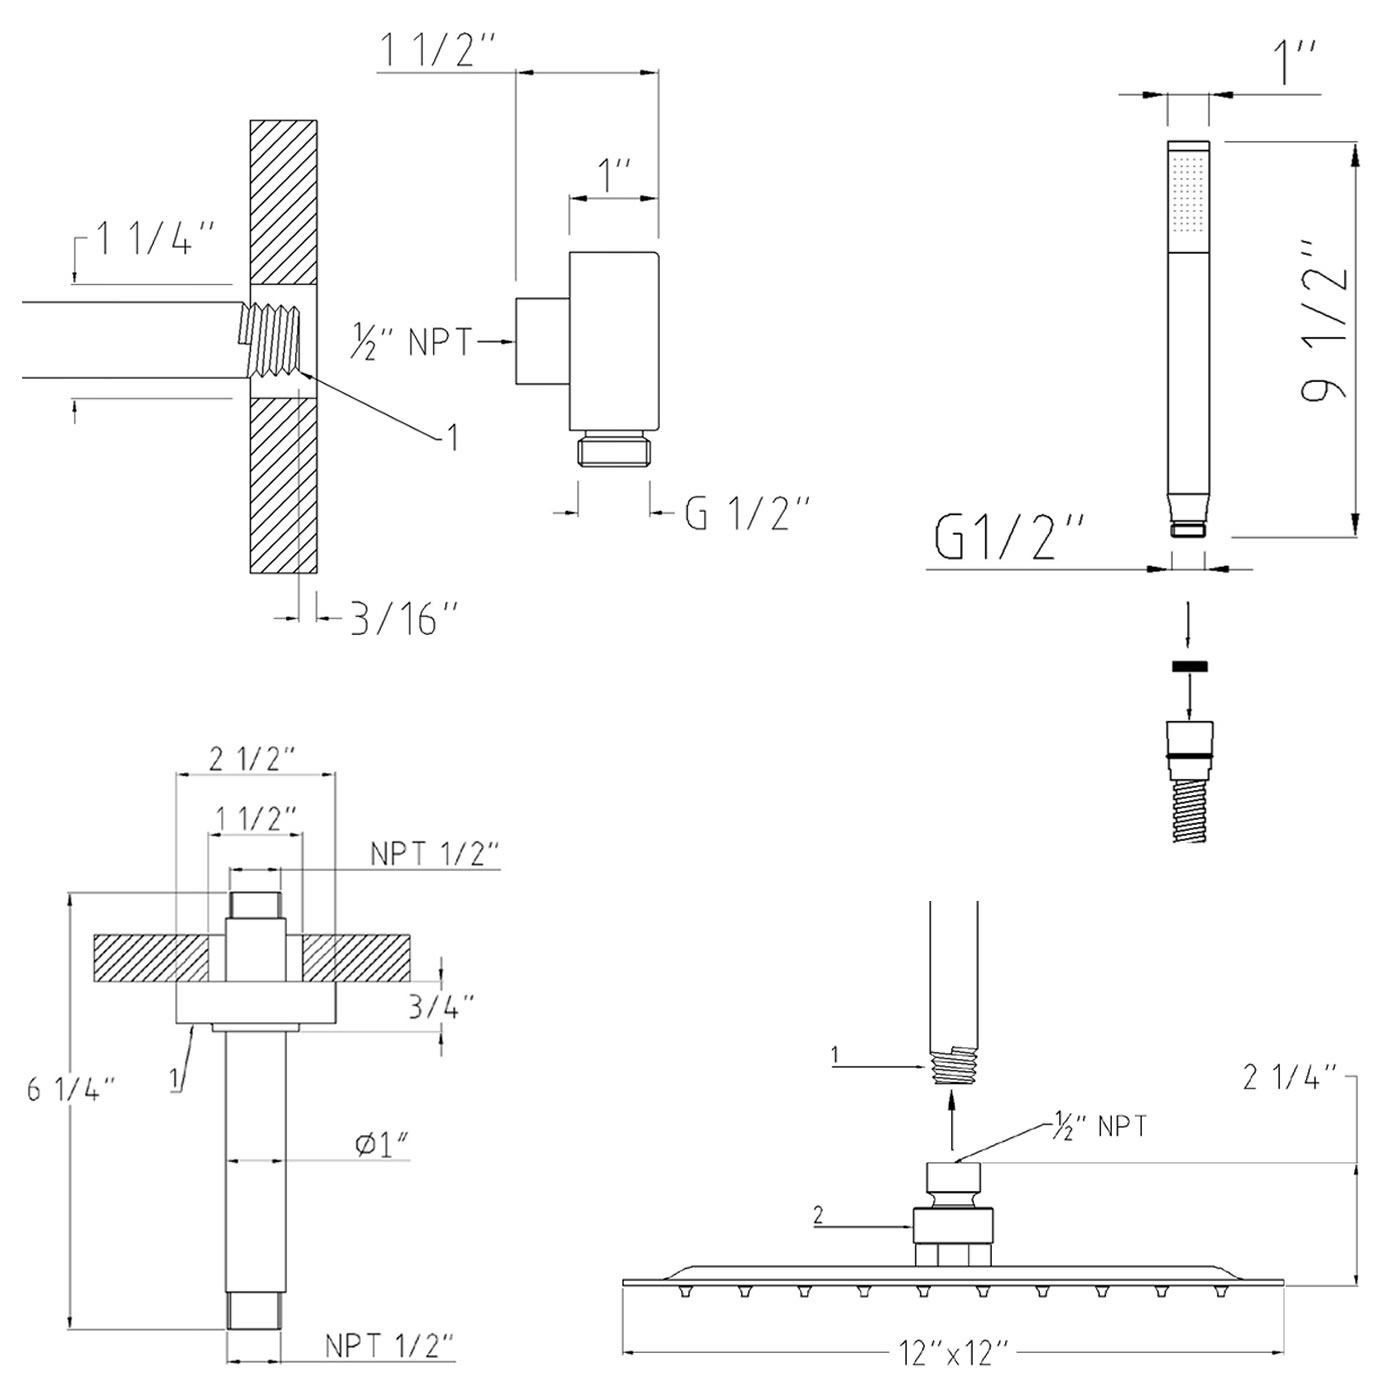 Lima Thermostatic Shower System 3 Way Mixer with 6 Body Spa Sprays